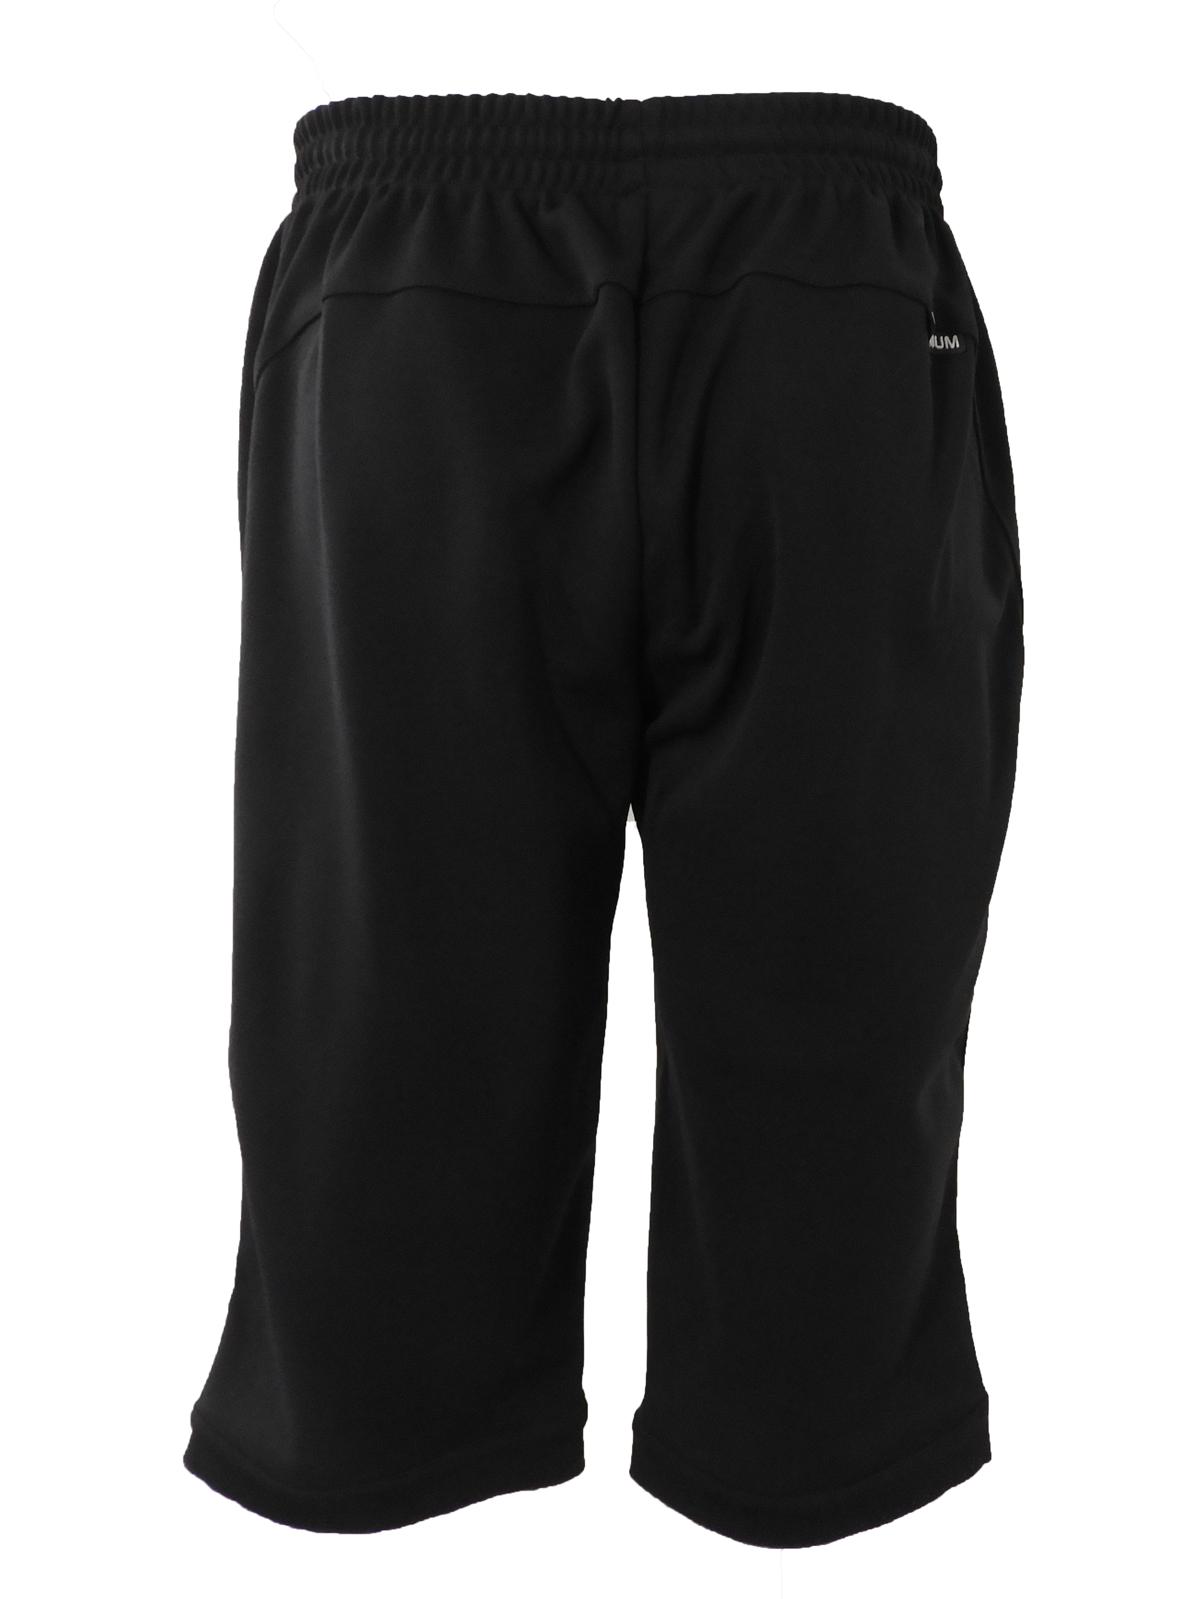 Jako Herren Trainingshose Bermuda - Sporthose - Größe 6/M - 8470-1